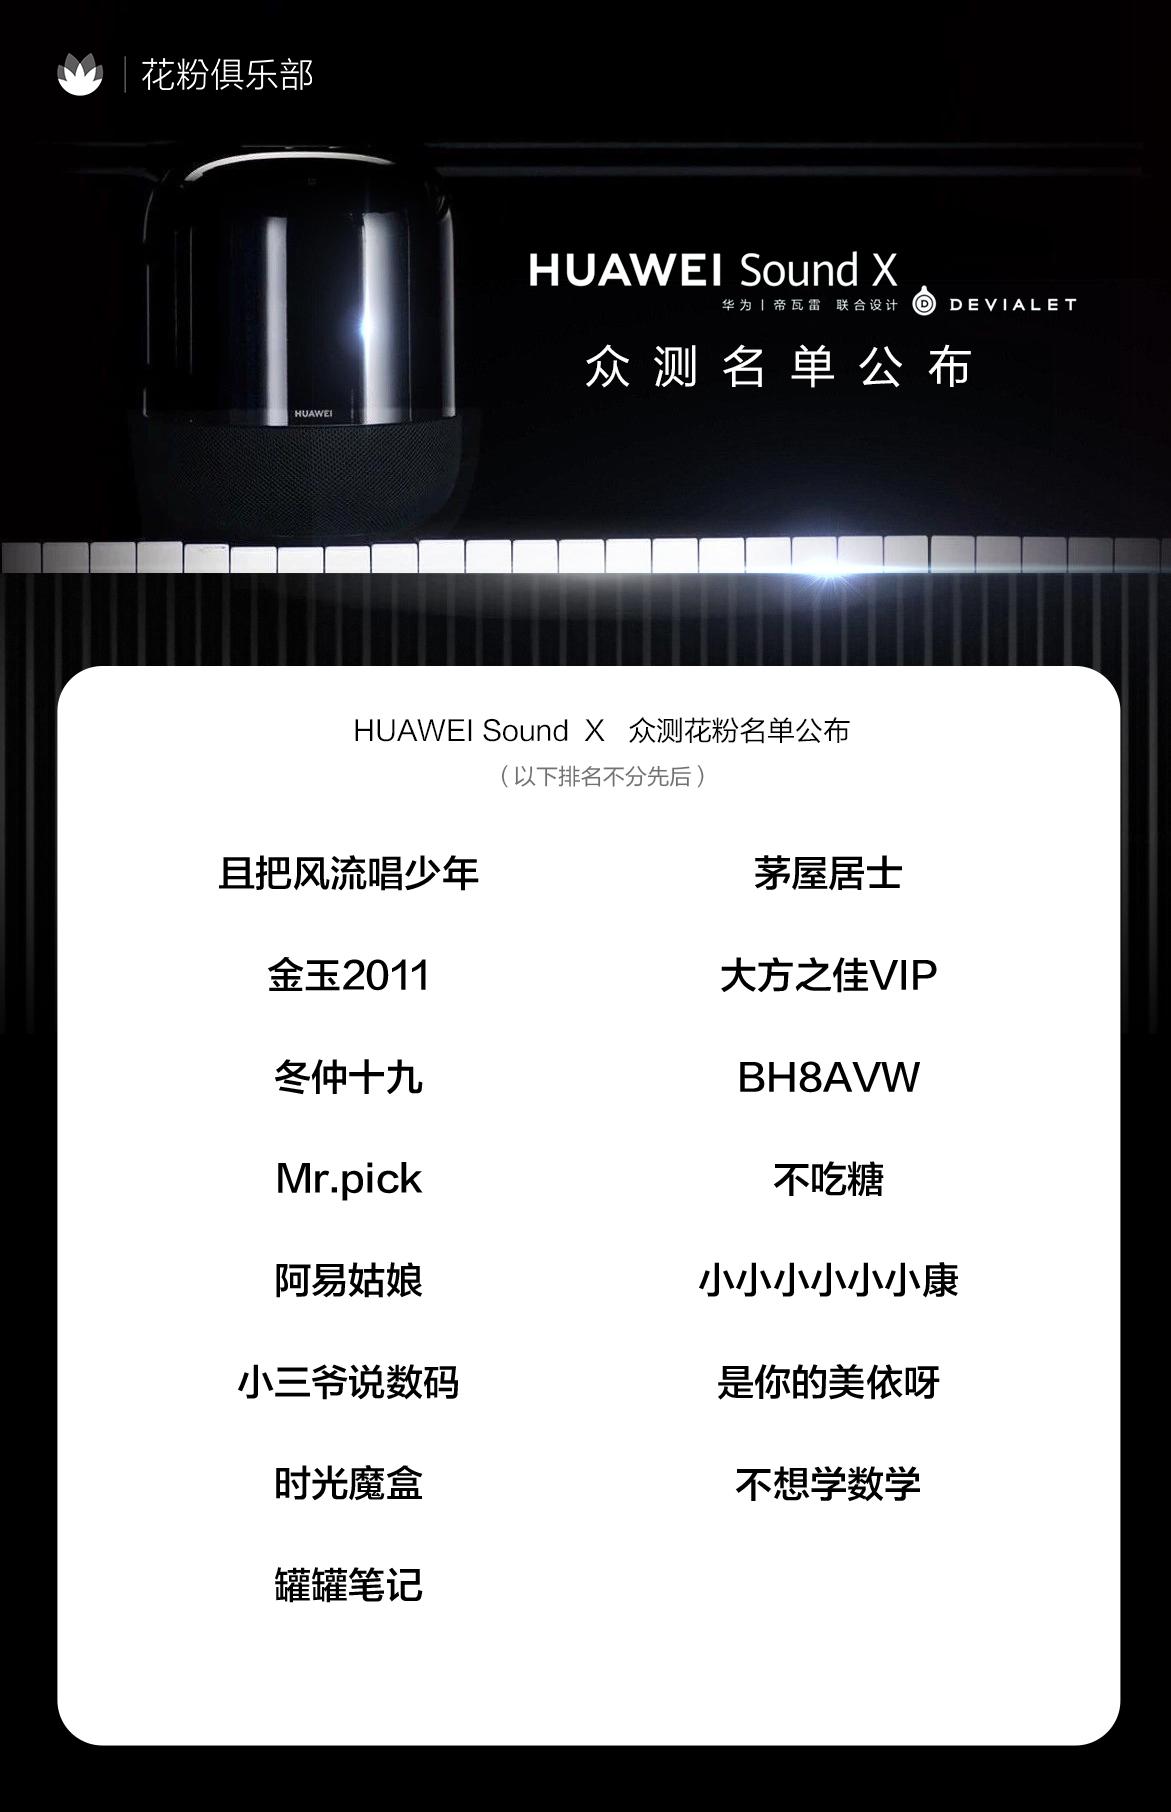 sound名单.jpg